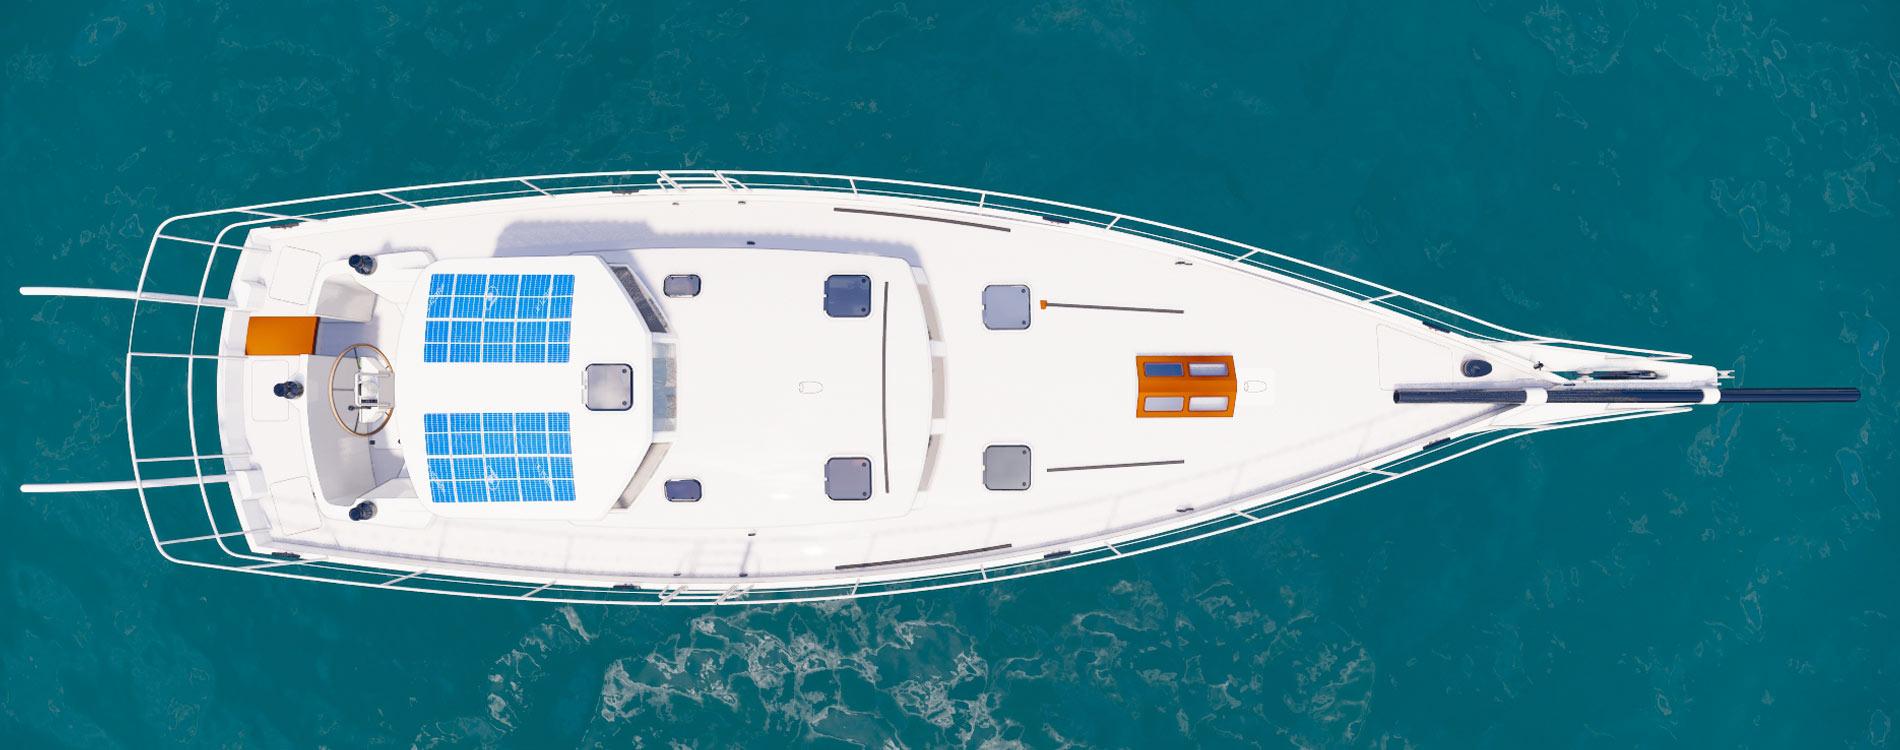 JMN45-schooner-aluminium-custom-Architecture-naval-Vincent-Lebailly-yacht-design-plan